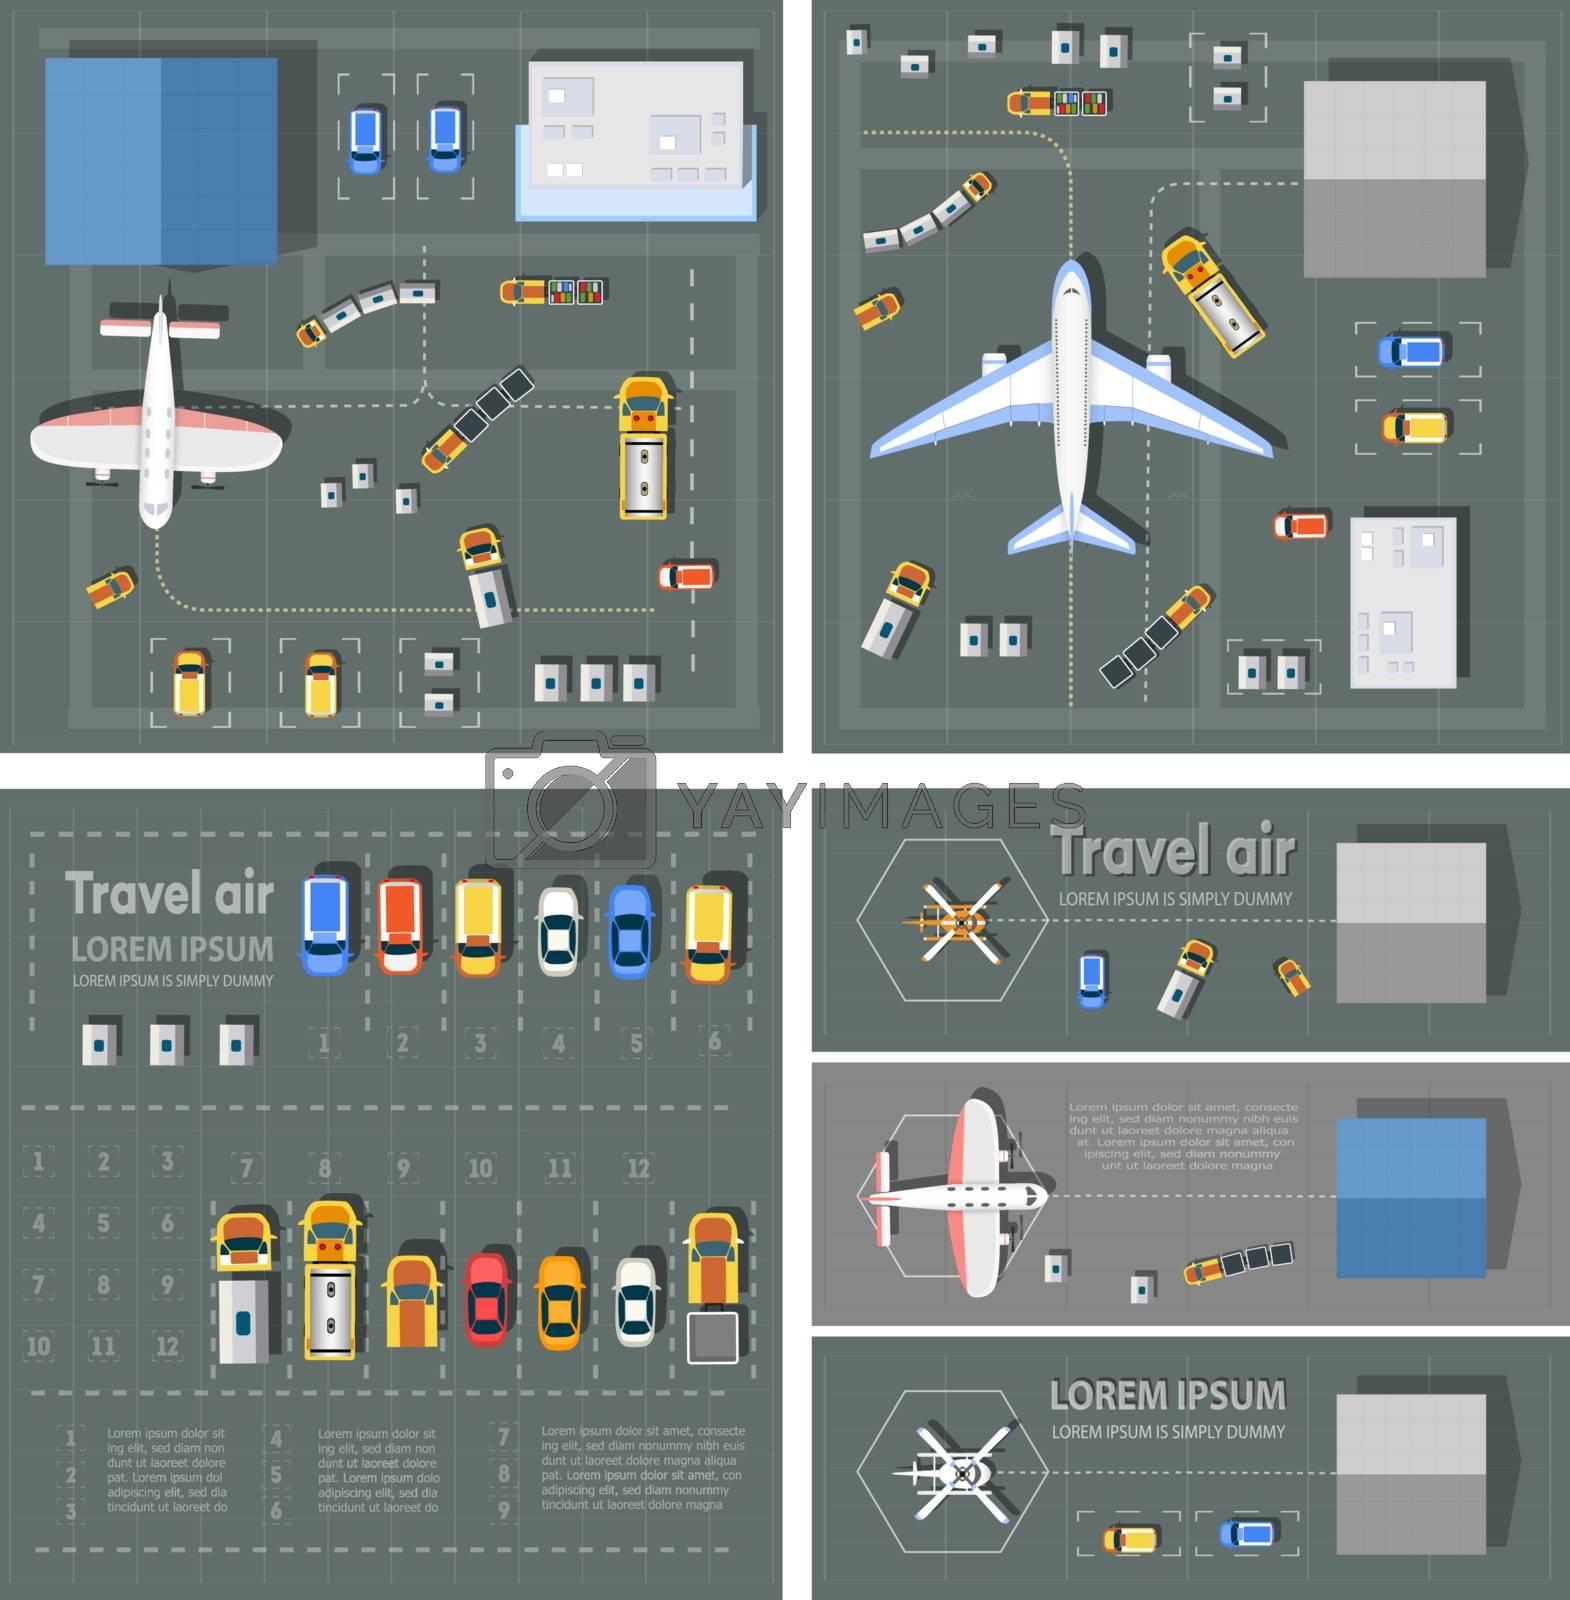 Airport passenger terminal by Alexzel